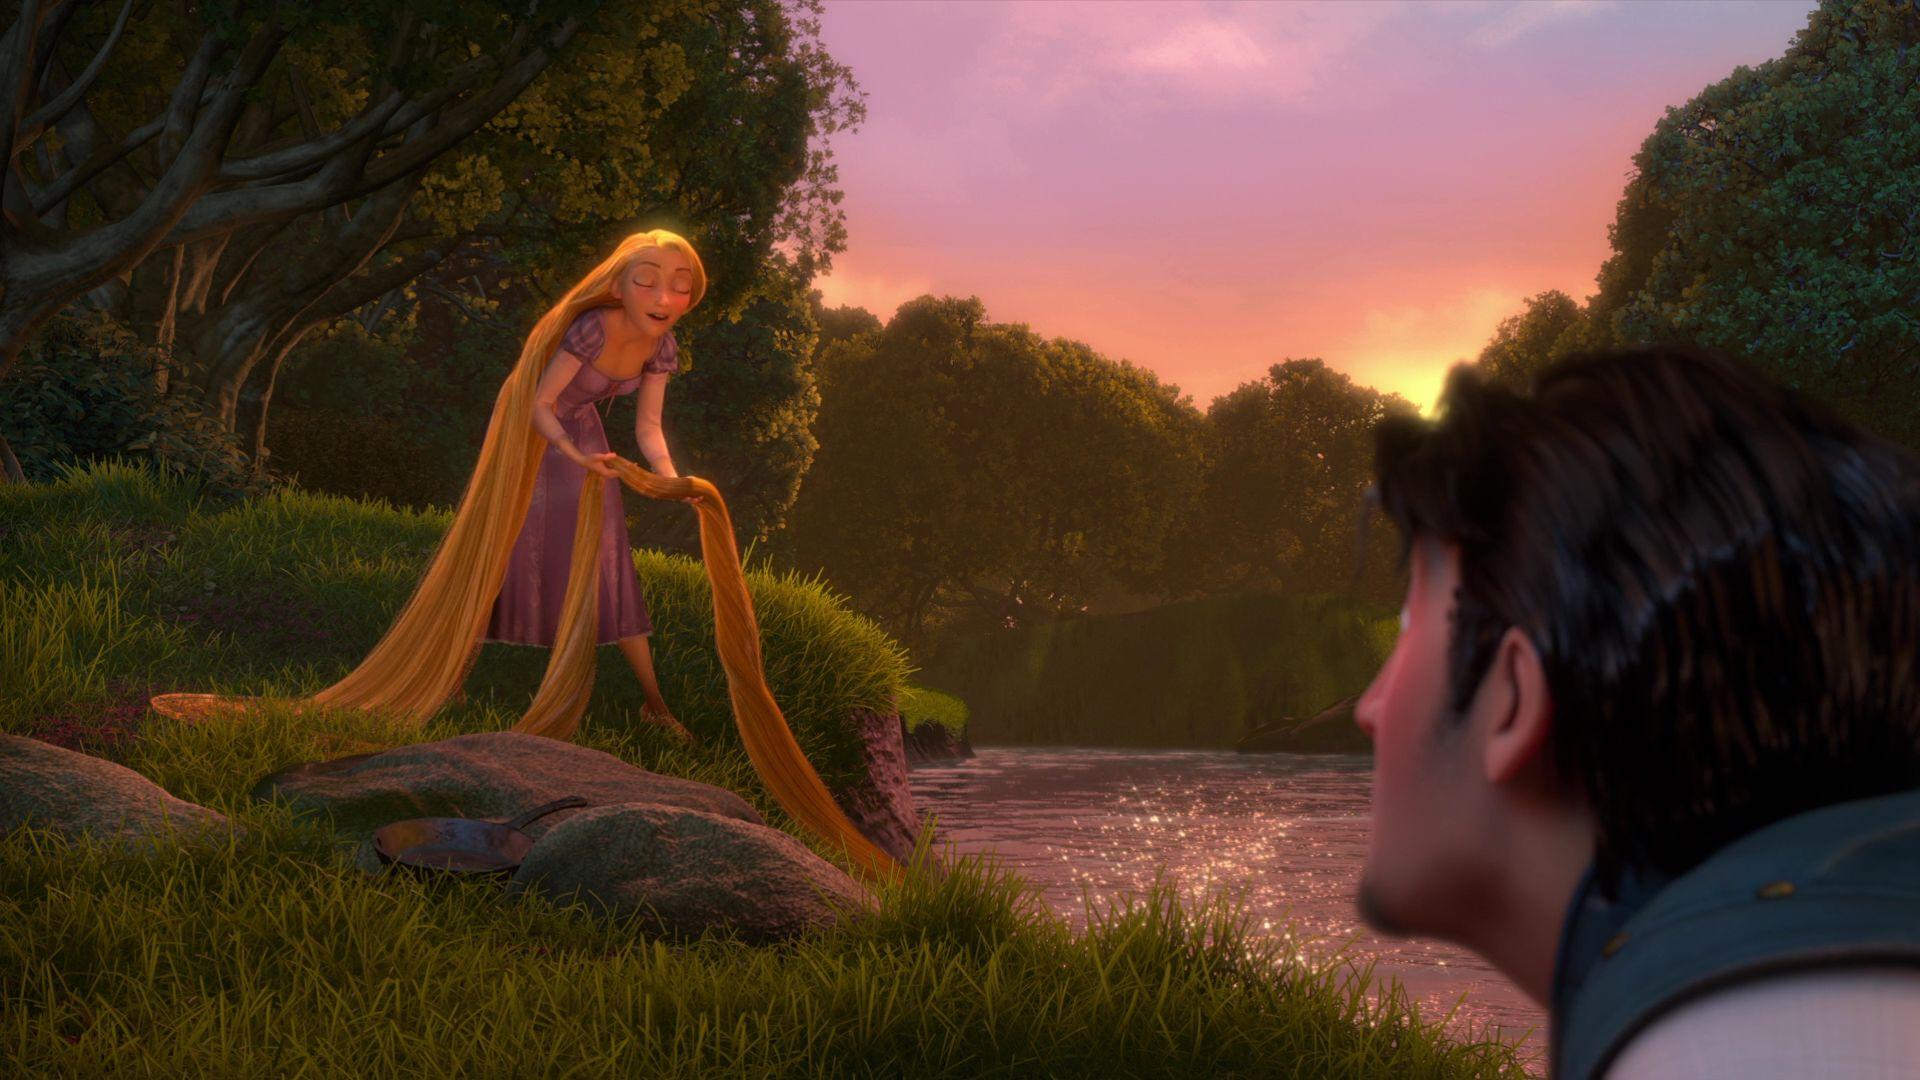 Rapunzel text